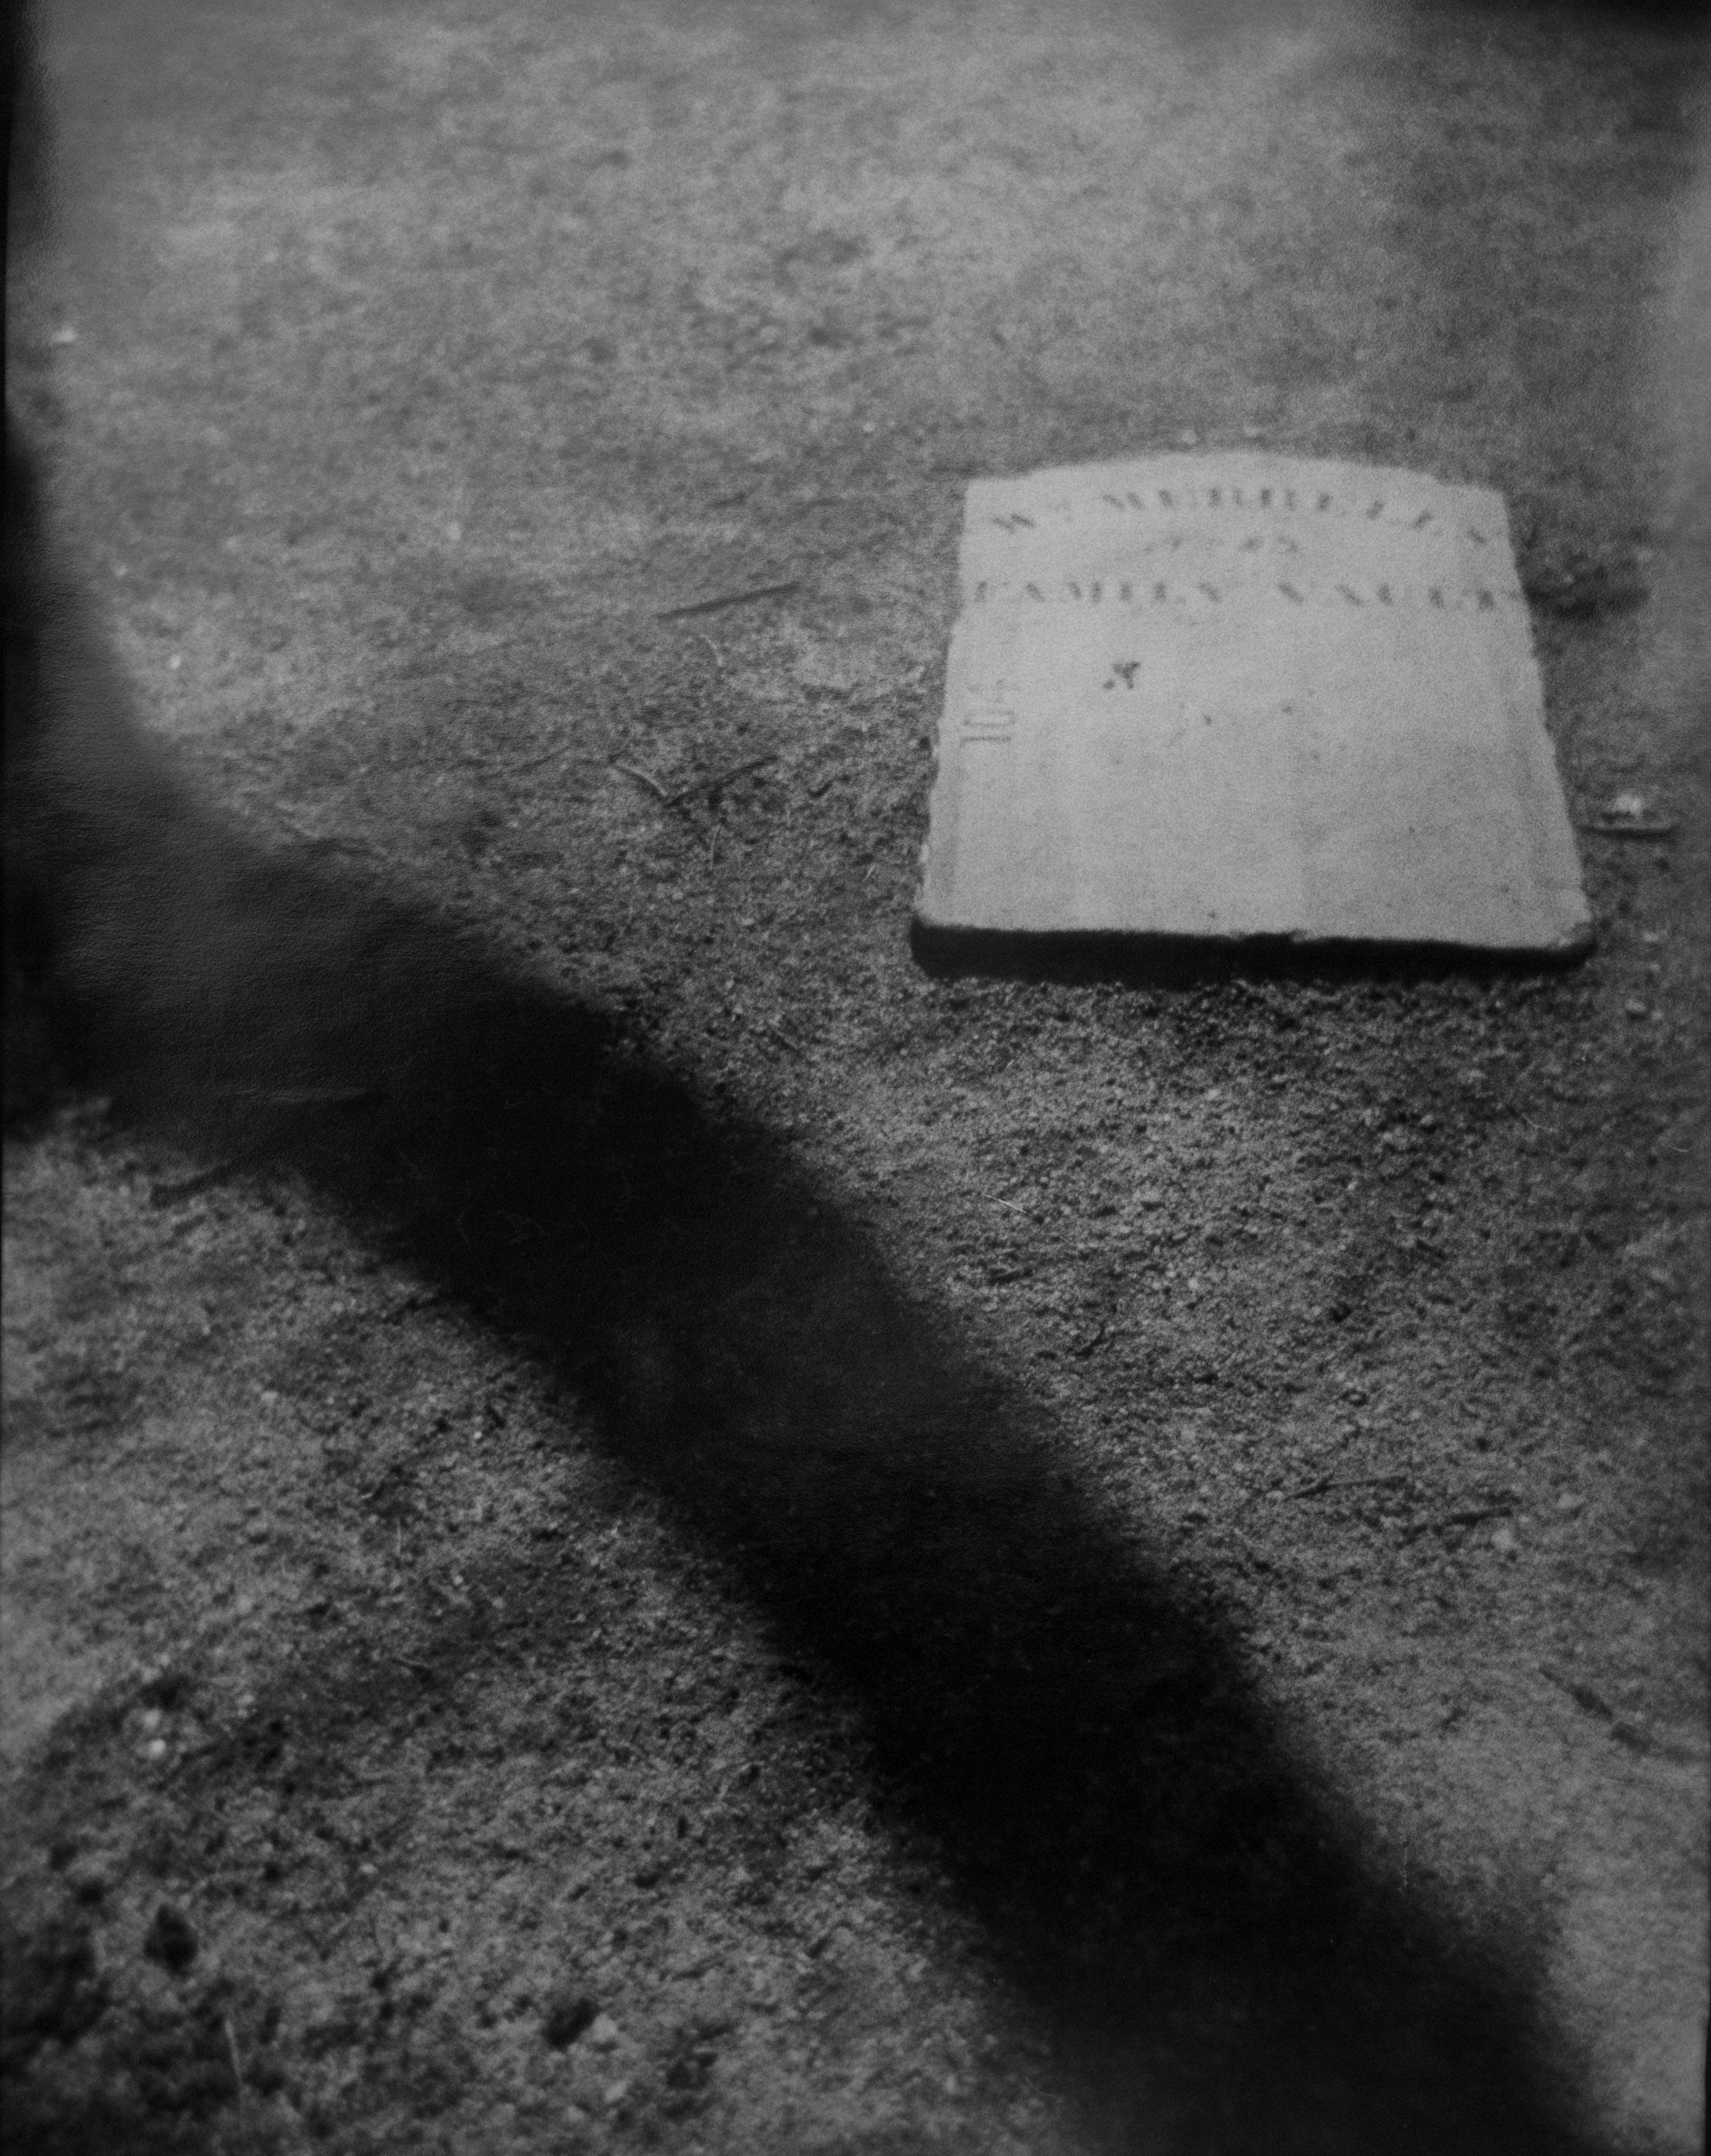 18_Grave Ground_St. Mark's Church-in-the-Bowerie, 1999-2000_.jpg